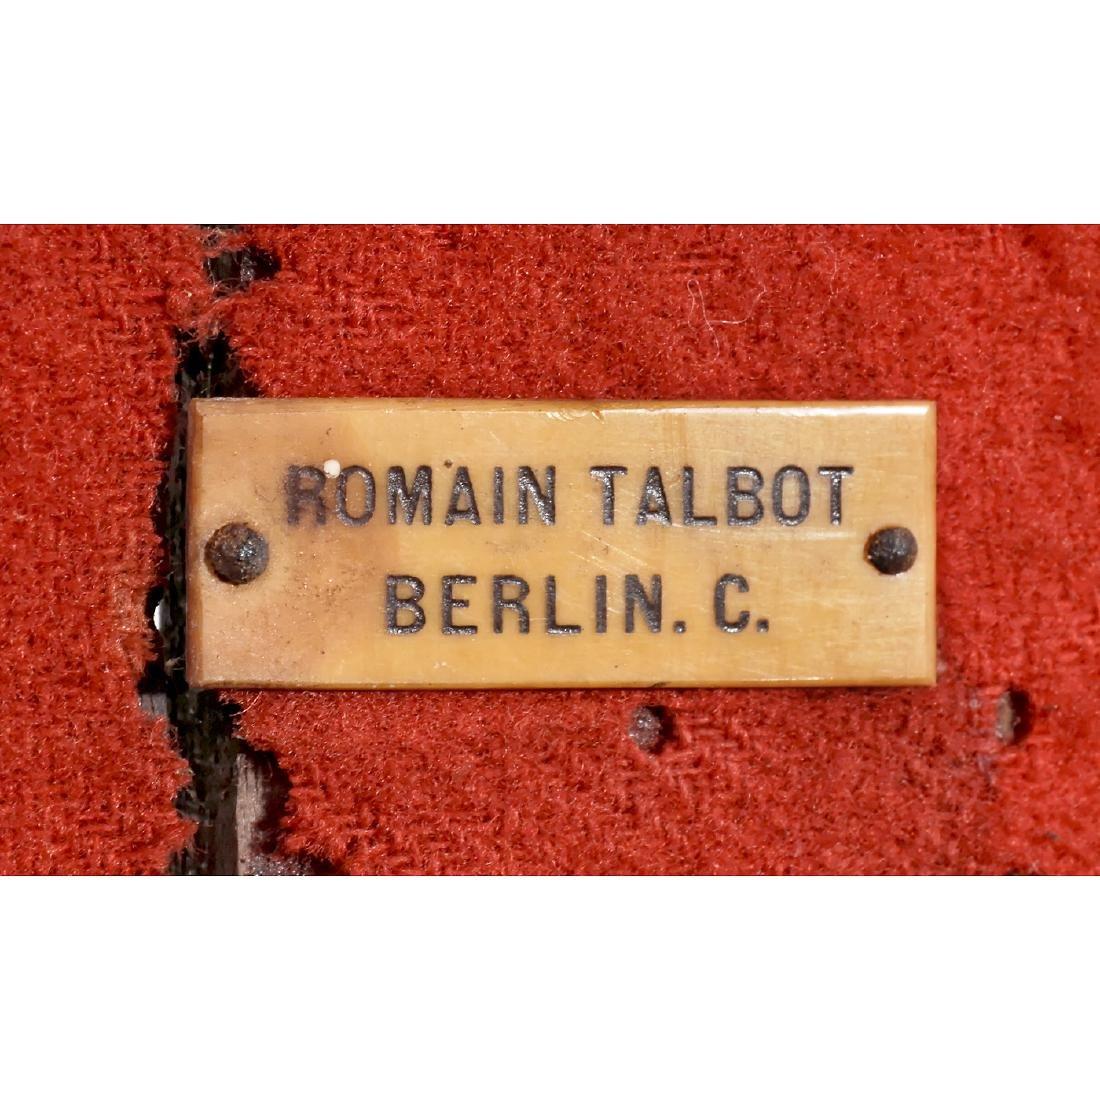 Stereo Camera 9 x 18 cm by Romain Talbot, Berlin, c. - 3